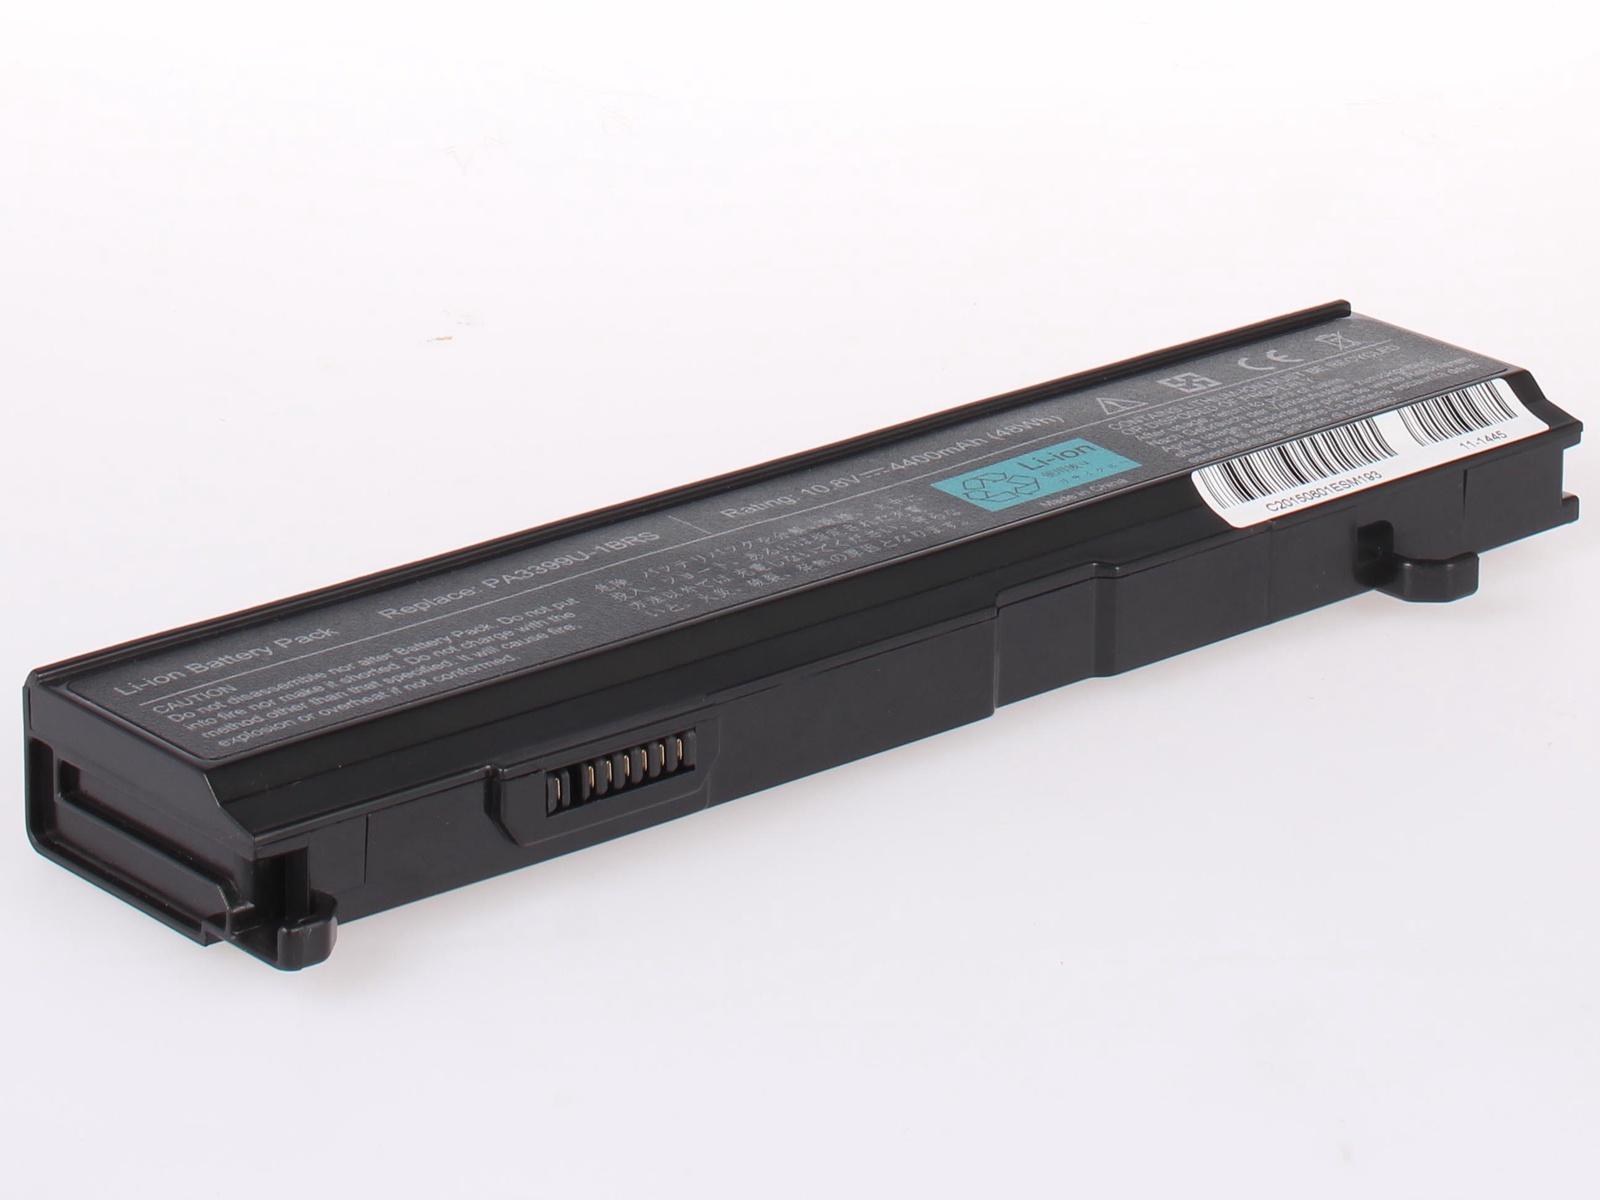 Аккумулятор для ноутбука AnyBatt для ToshiBa Satellite M100-165, Satellite M110, Satellite M115-S3154, Satellite M40-237, Satellite A100-01Q, Satellite A100-097, Satellite M105-S3041, Satellite M40-140, Equium A100 цена